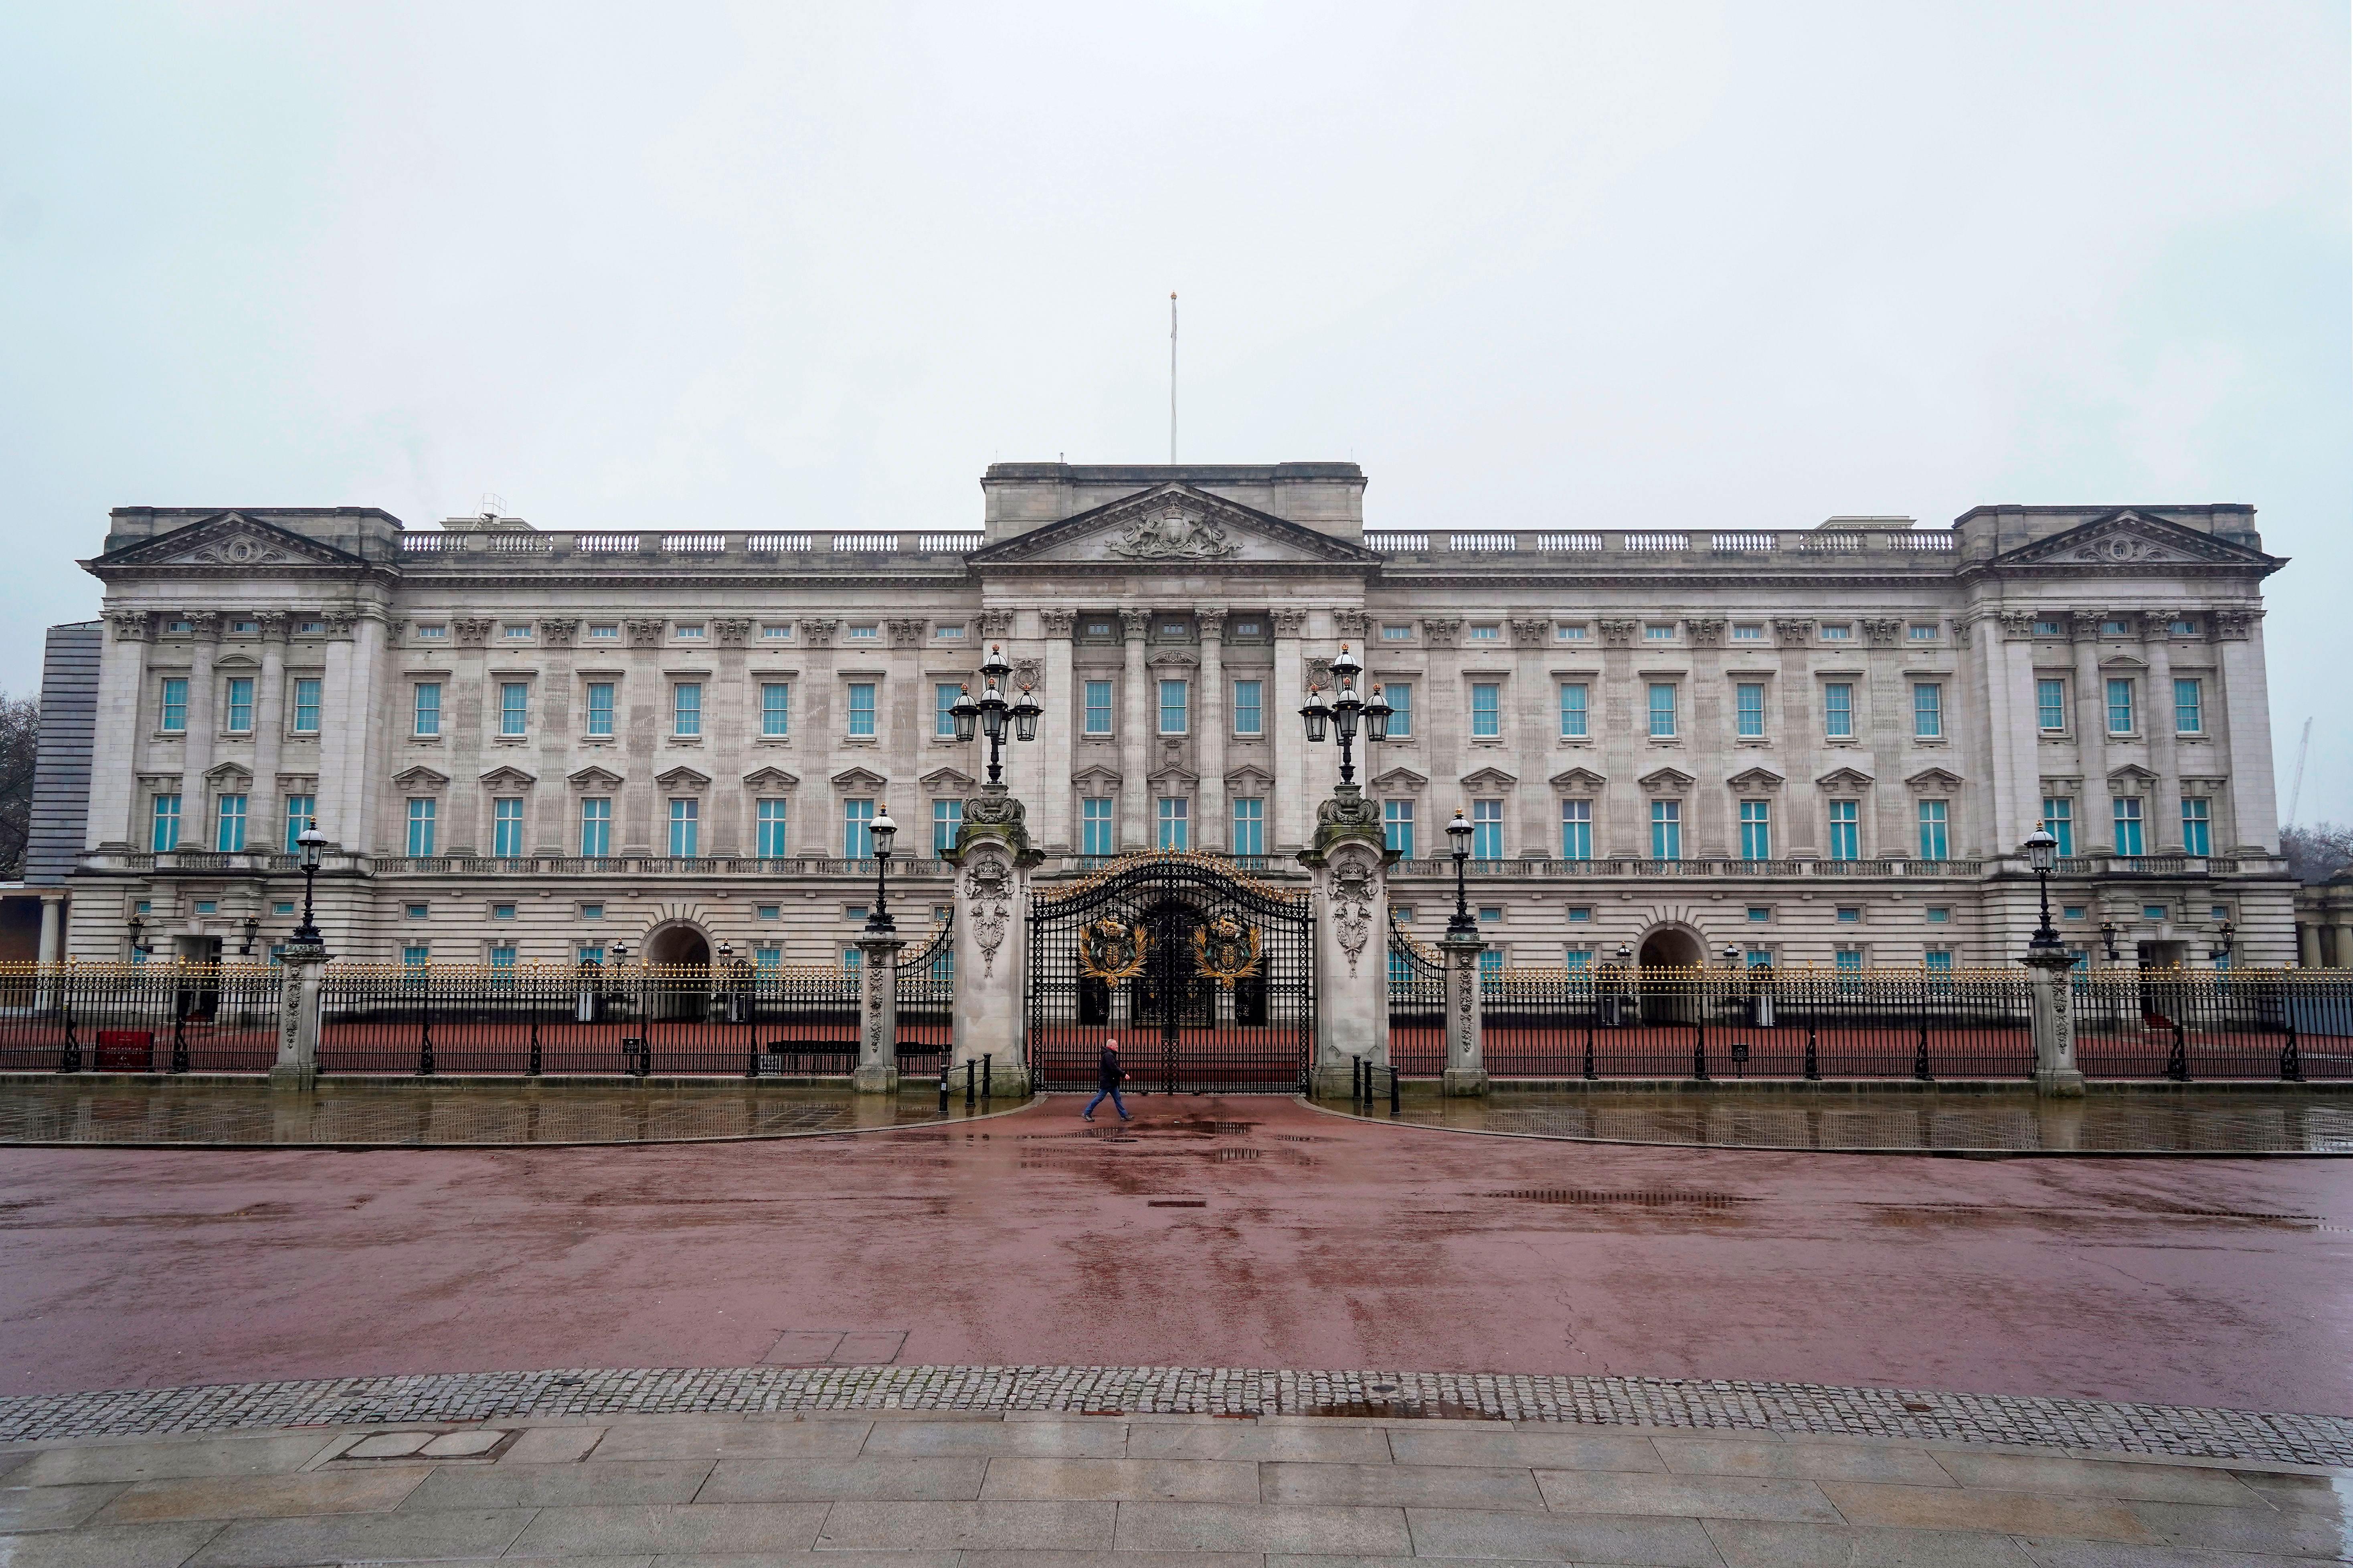 Buckingham Palace in London on January 14.